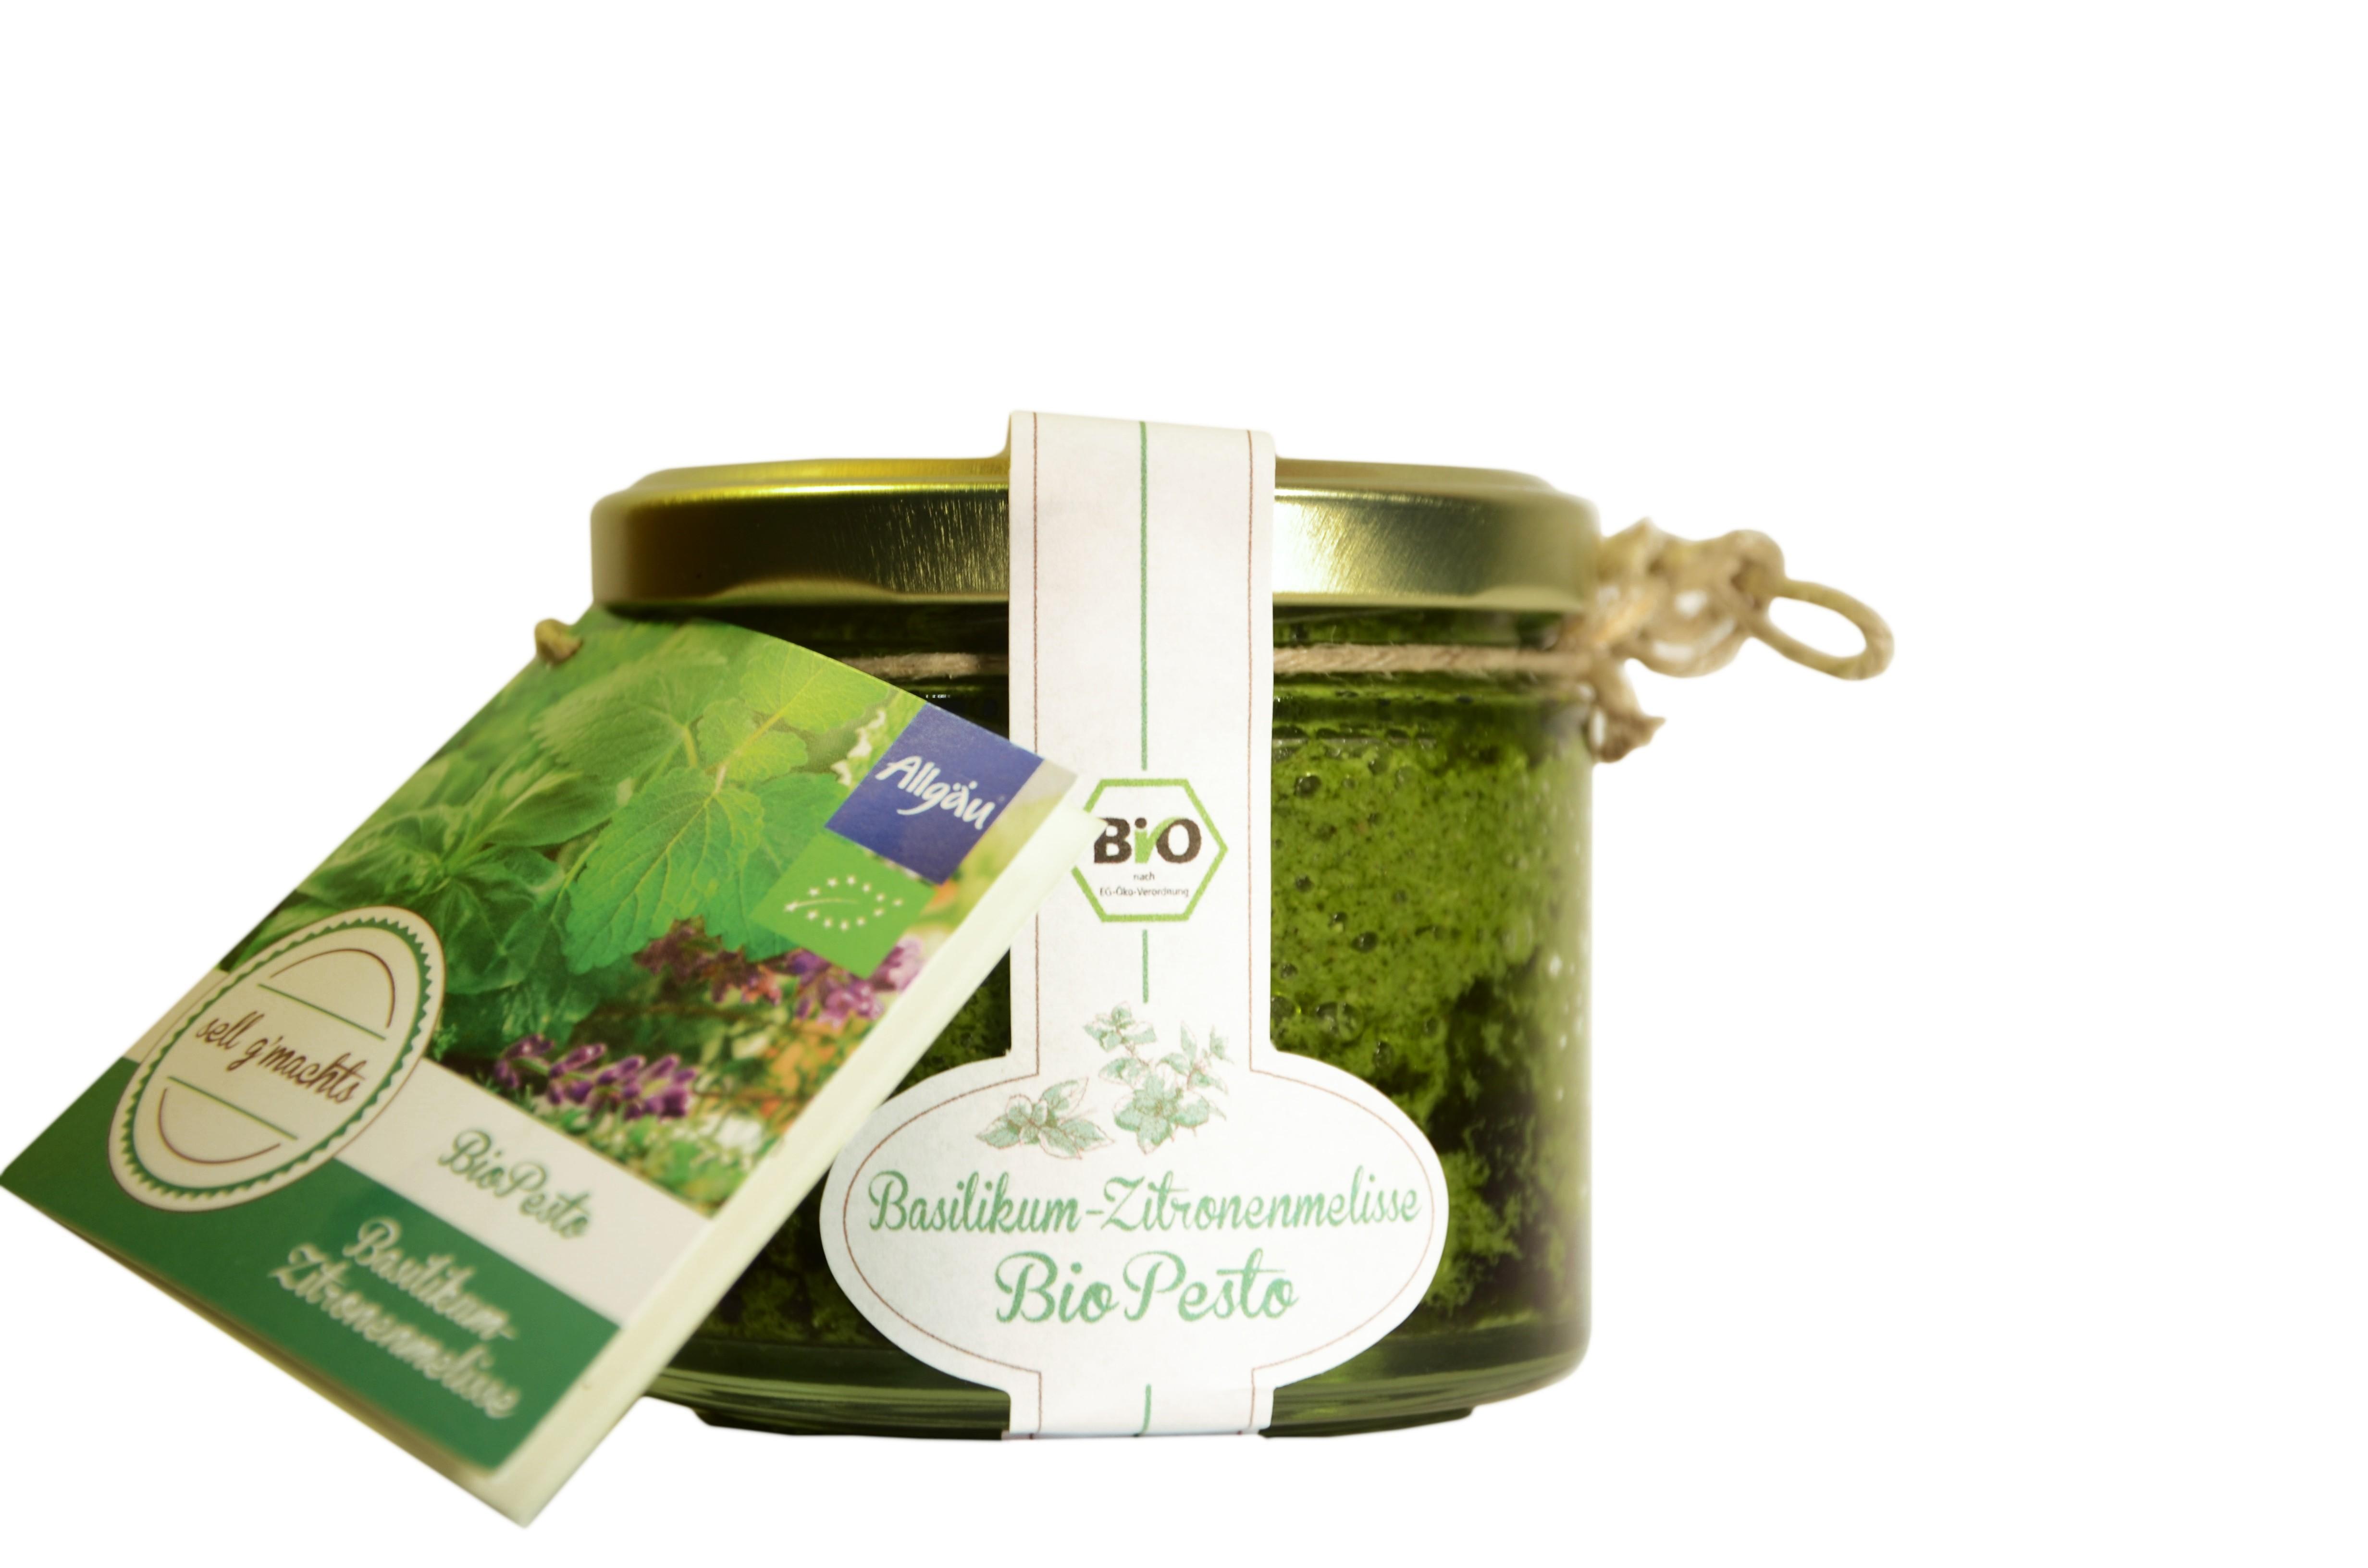 Basilikum-Zitronenmelisse Pesto 110g bio